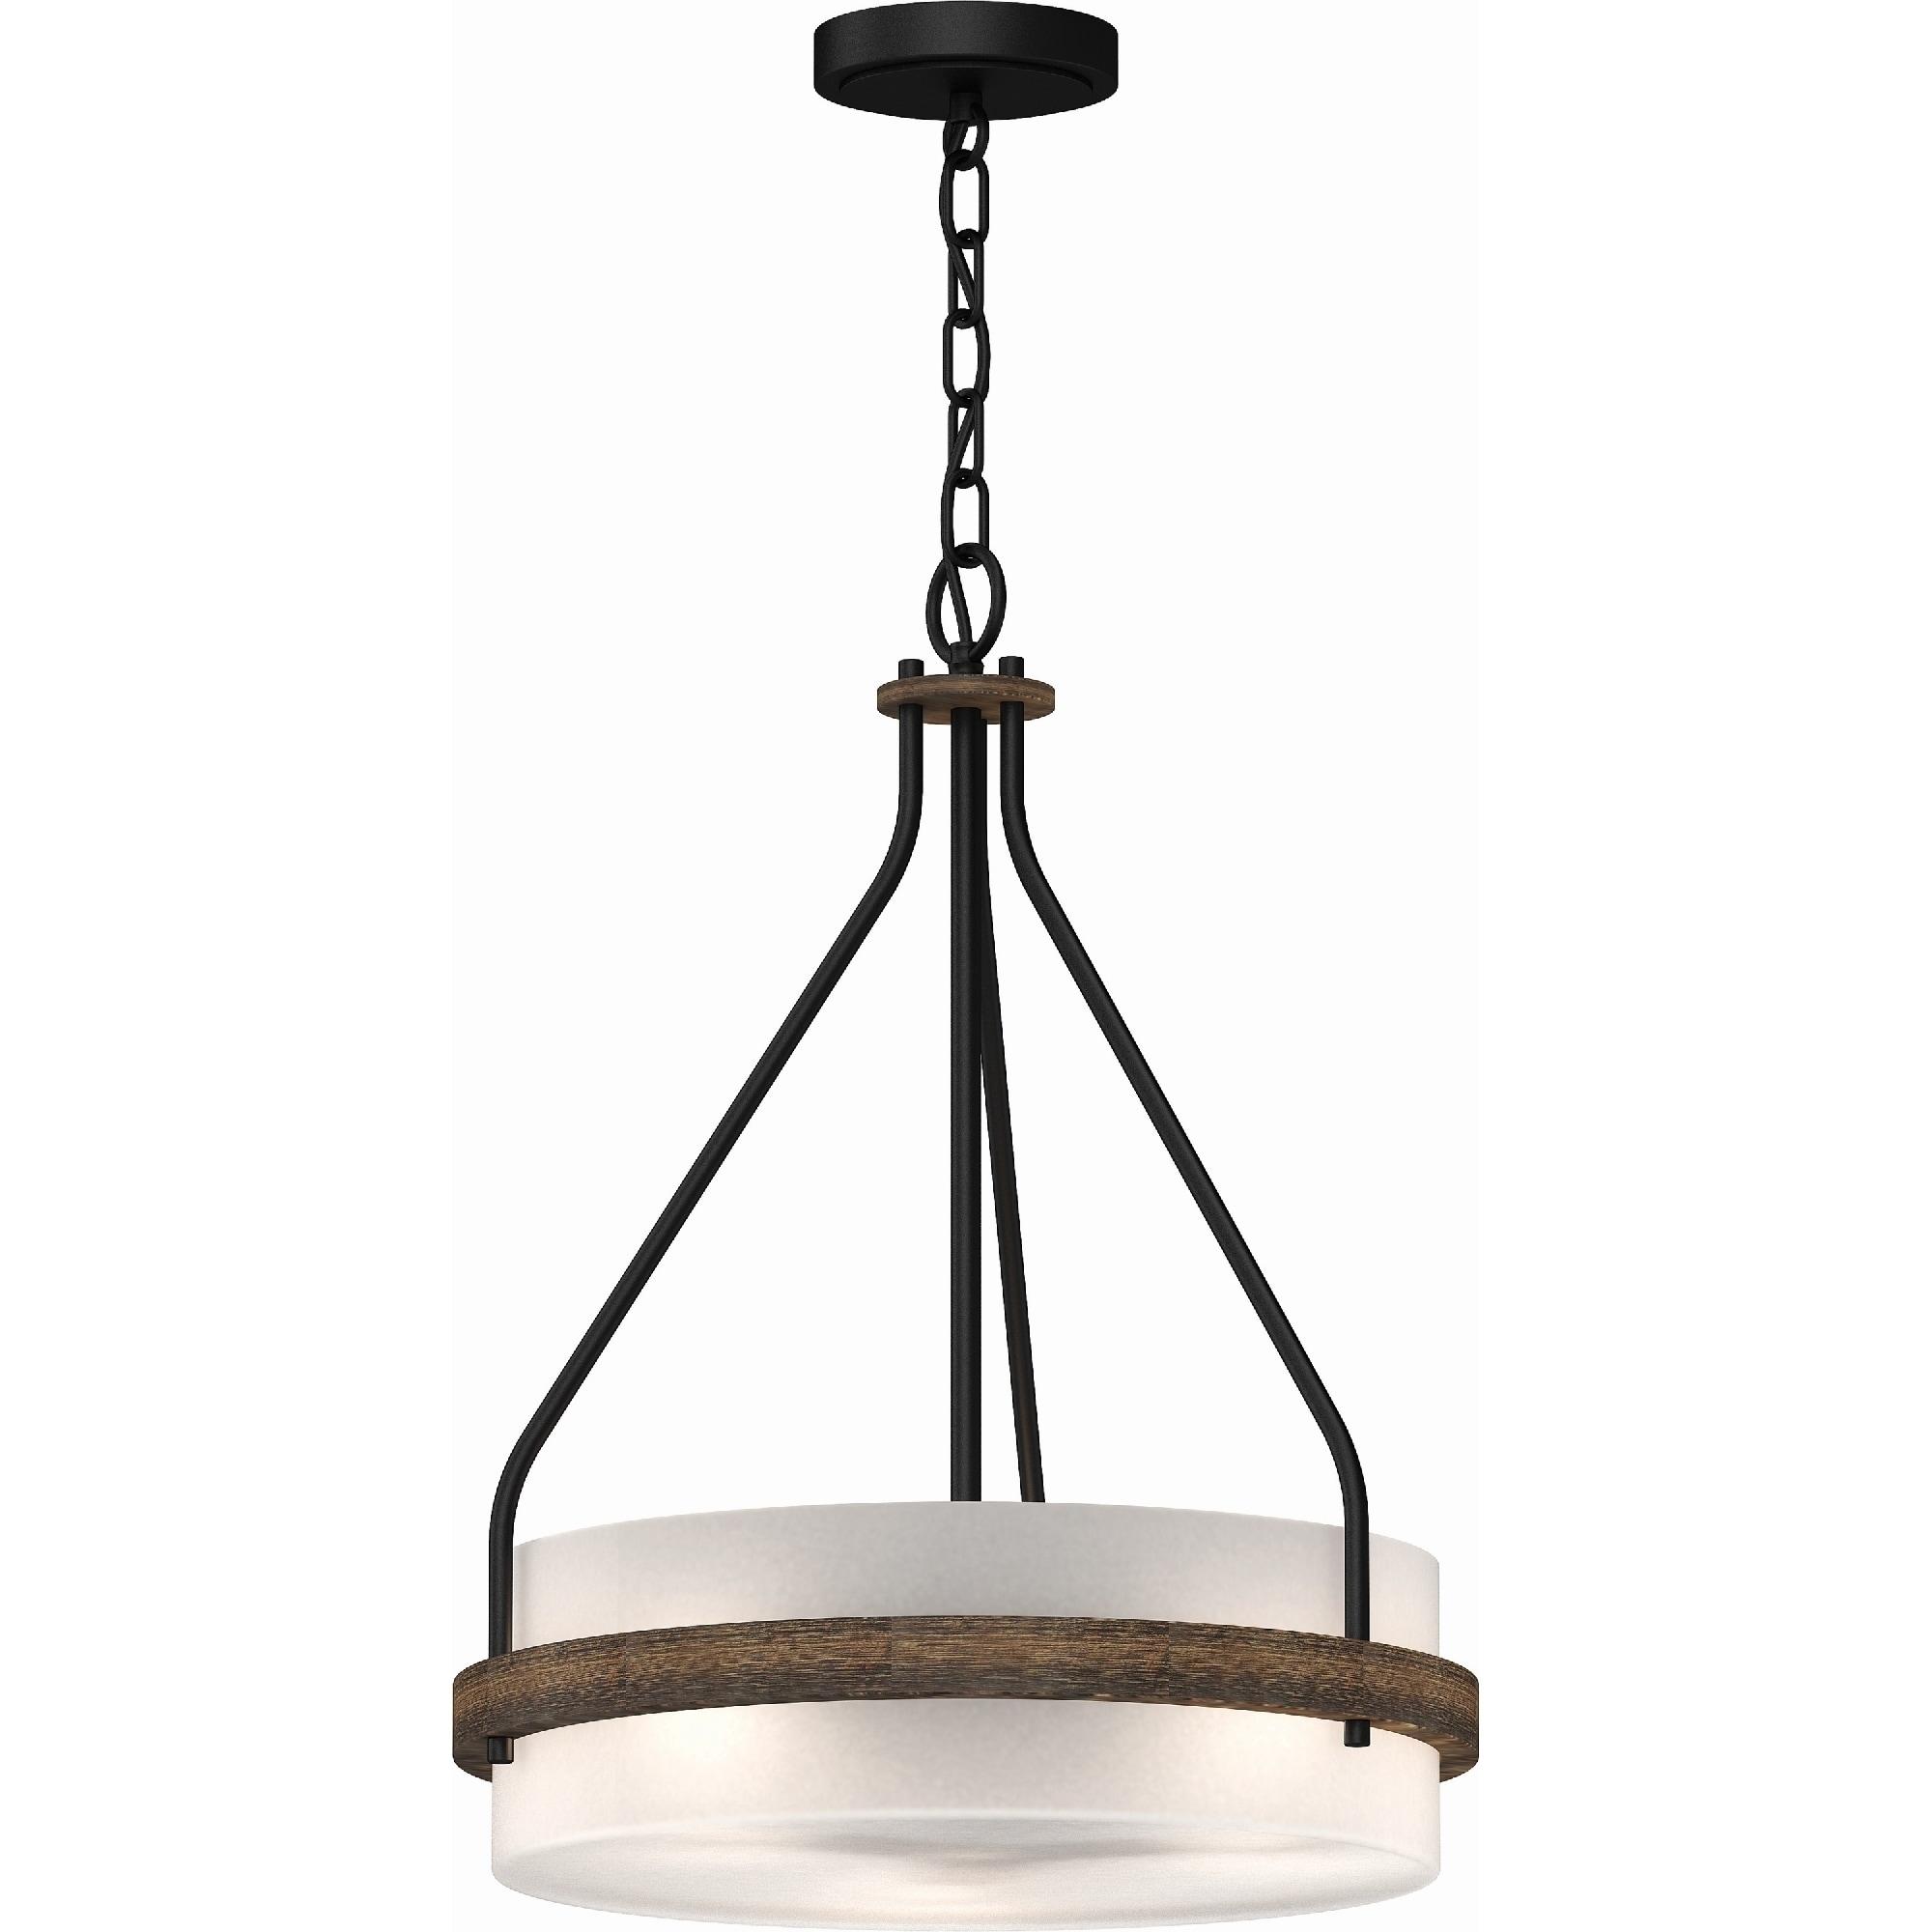 Volume Lighting Emery 3 Light Walnut Black Mini Hanging Chandelier Walnut Black Overstock 30237280